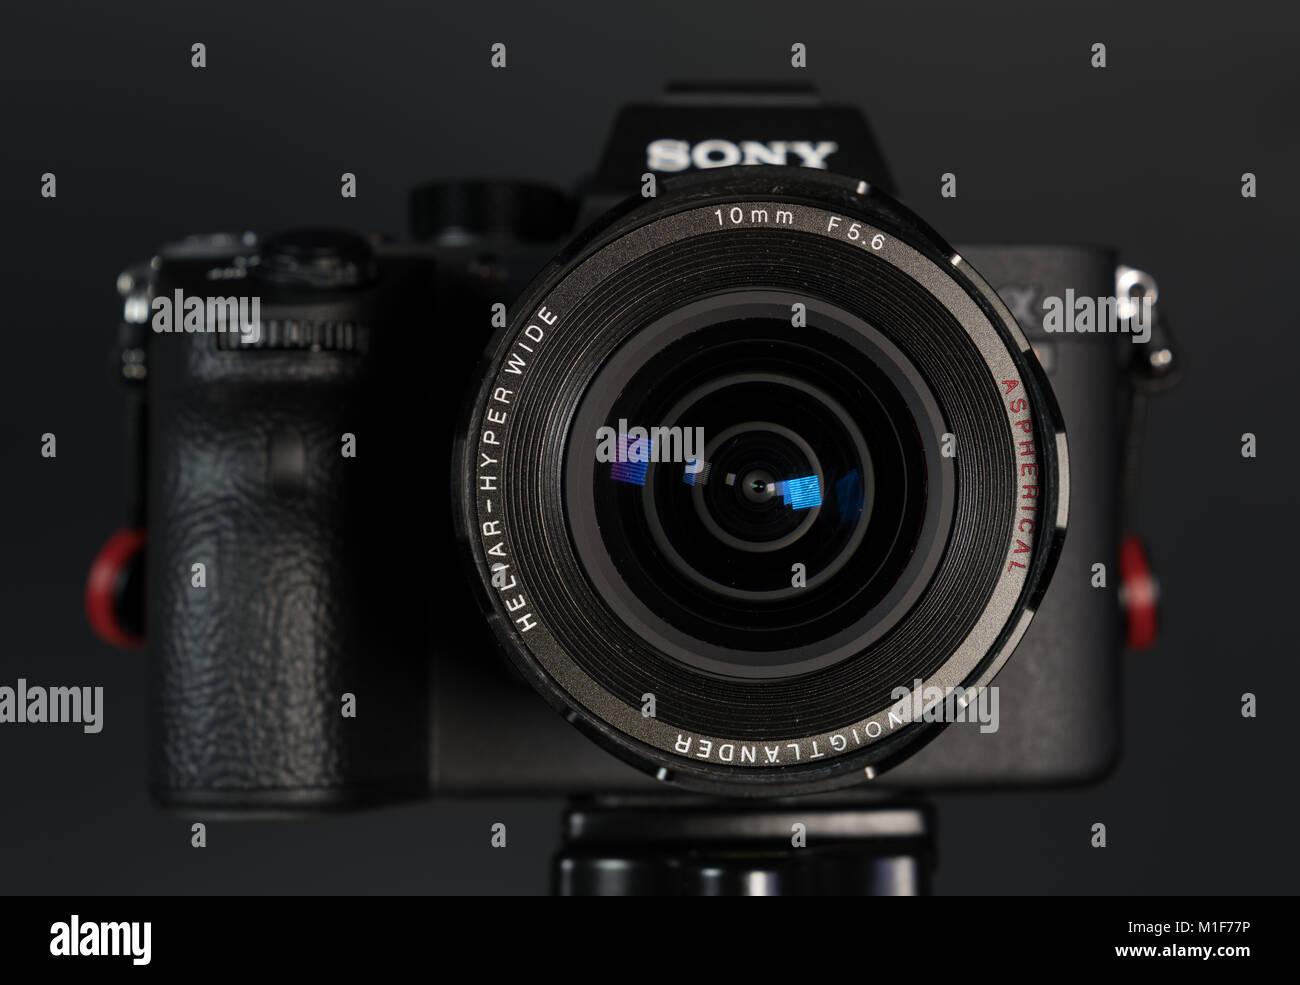 Sony Camera Photography Cameras Digital Samsung Editorial